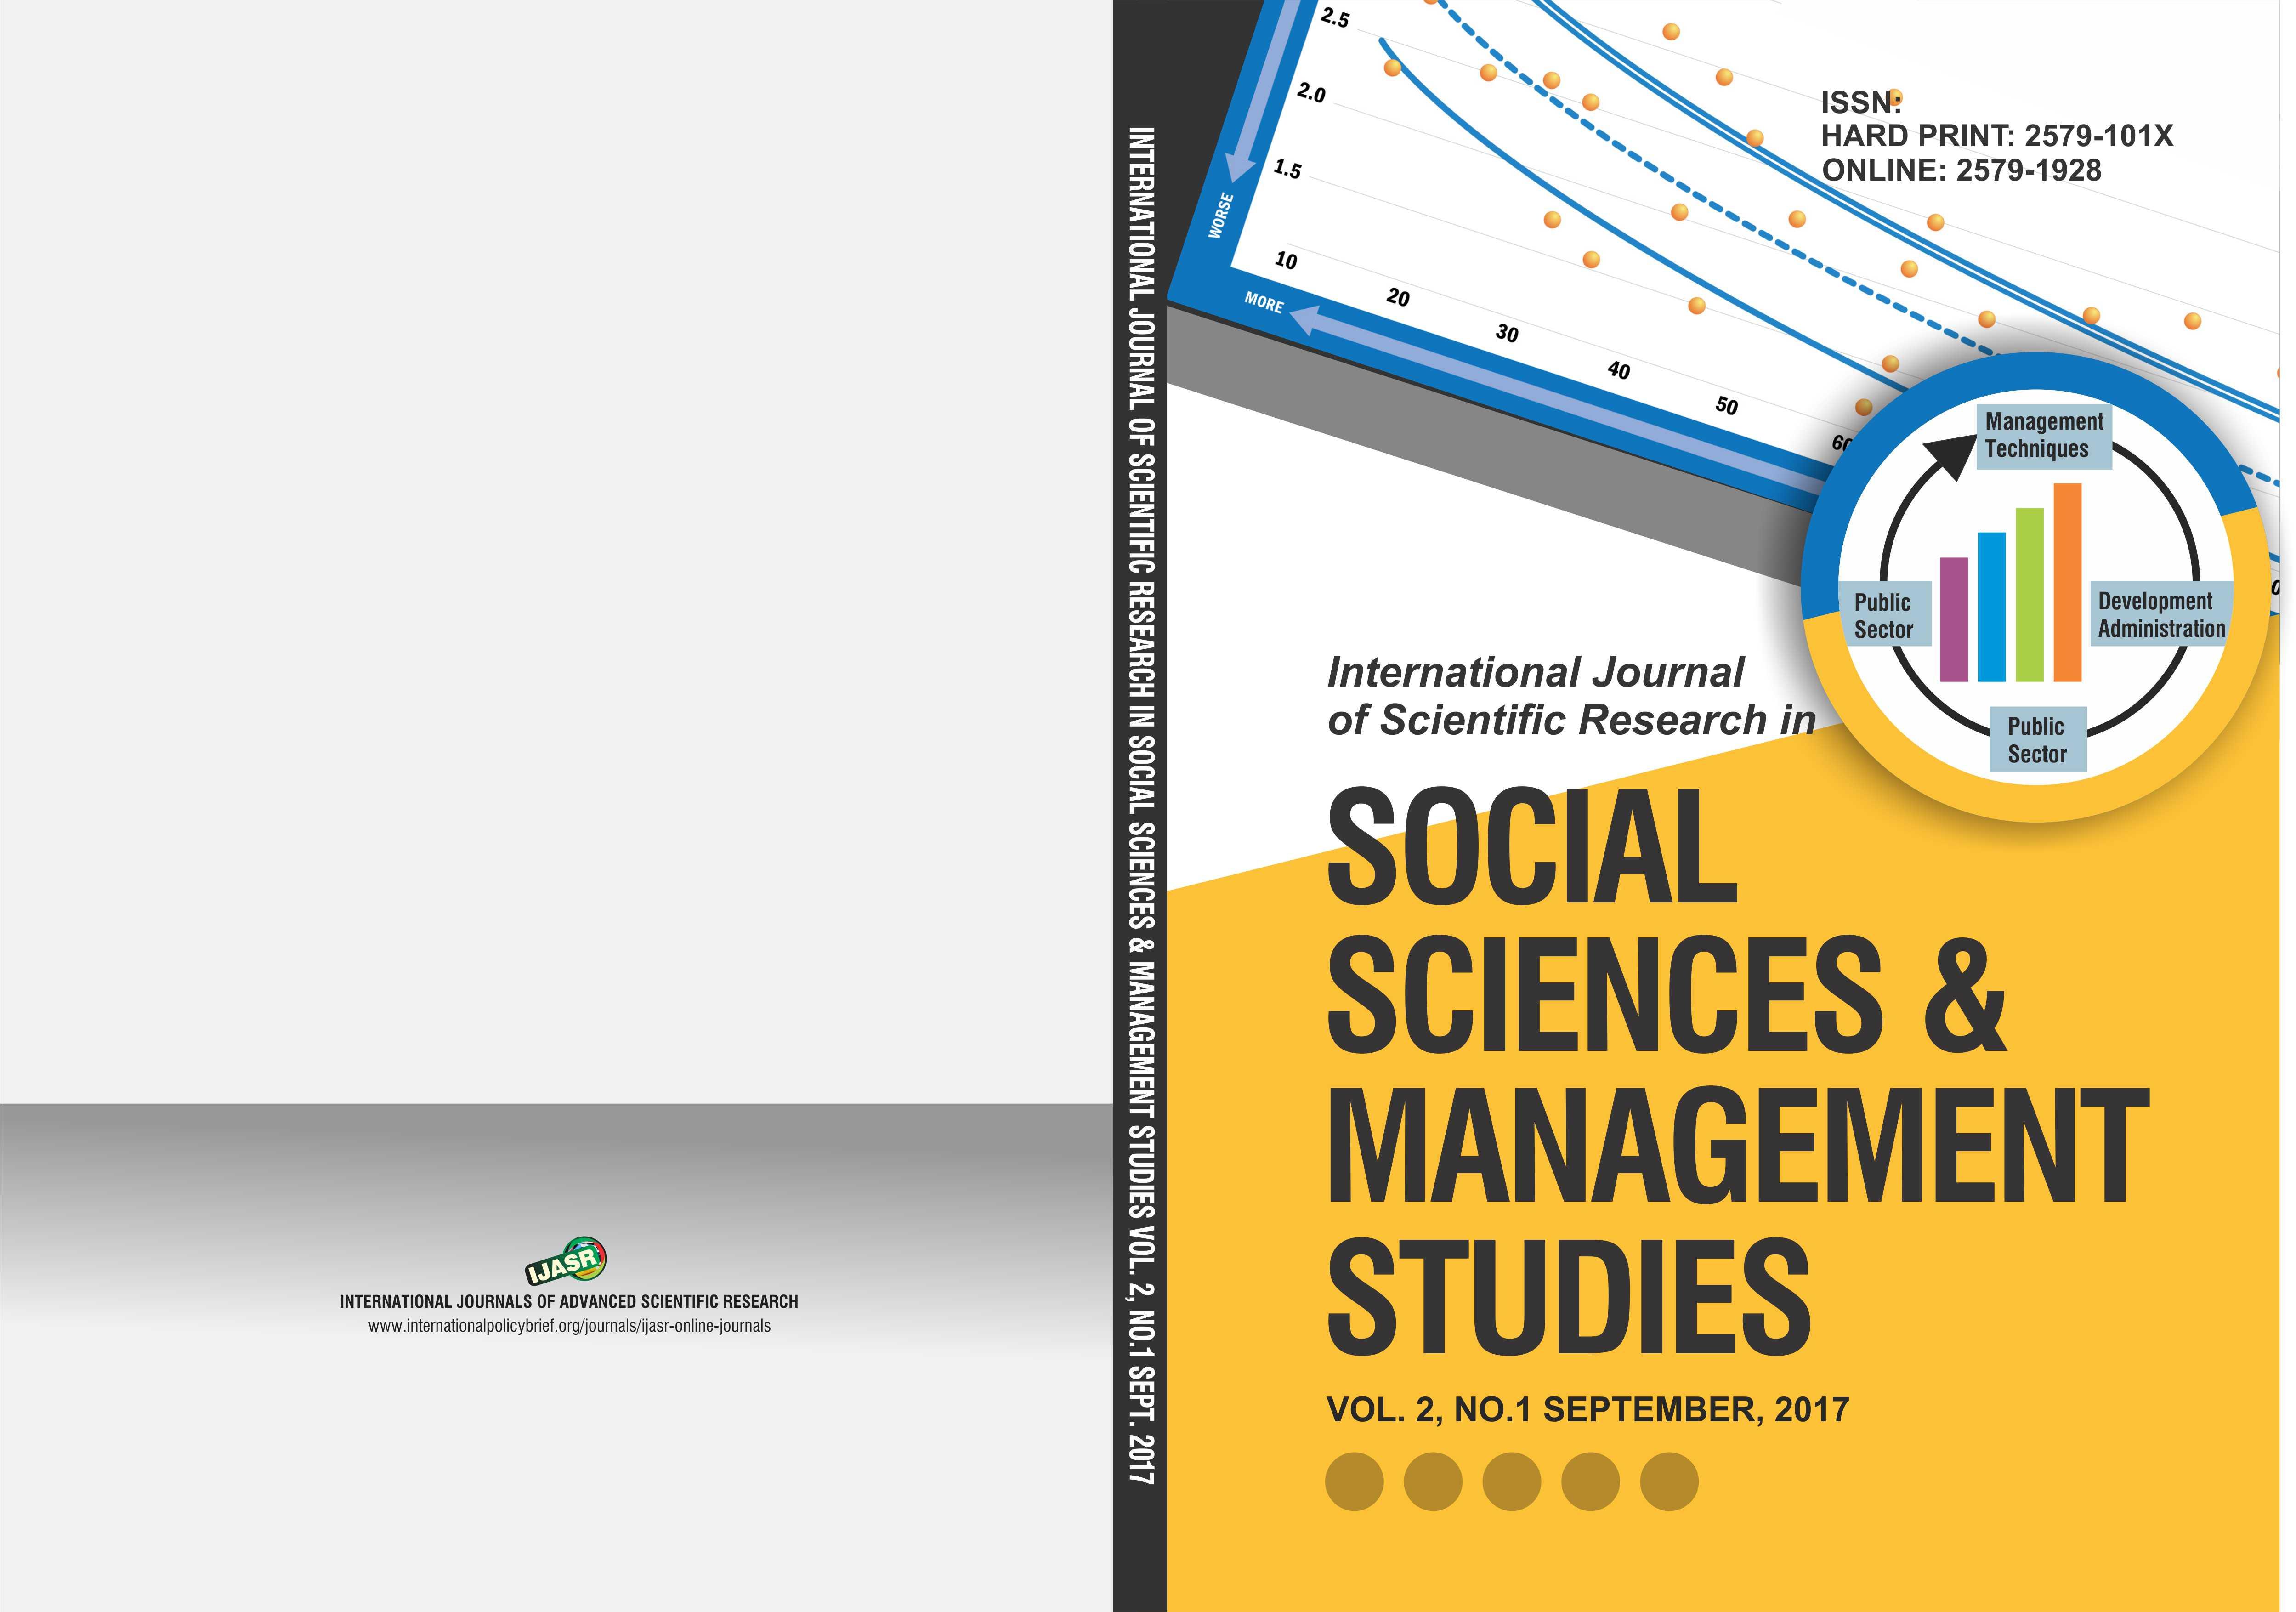 Intl Jrnl of Sci Research in Social Sciences & Mgt Studies Vol2  No1